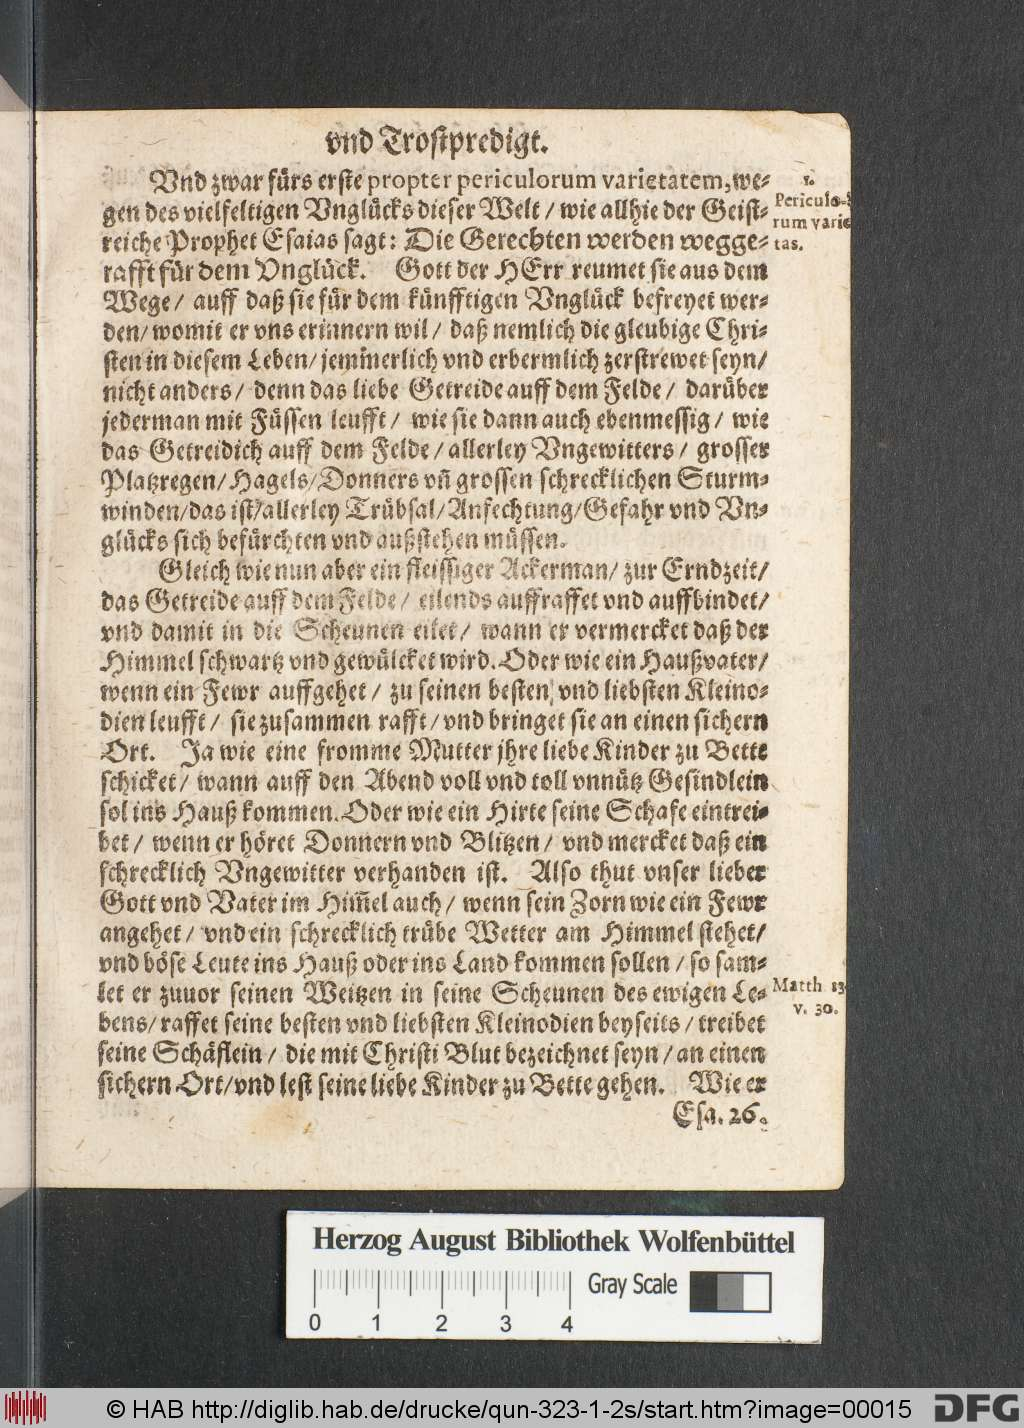 http://diglib.hab.de/drucke/qun-323-1-2s/00015.jpg